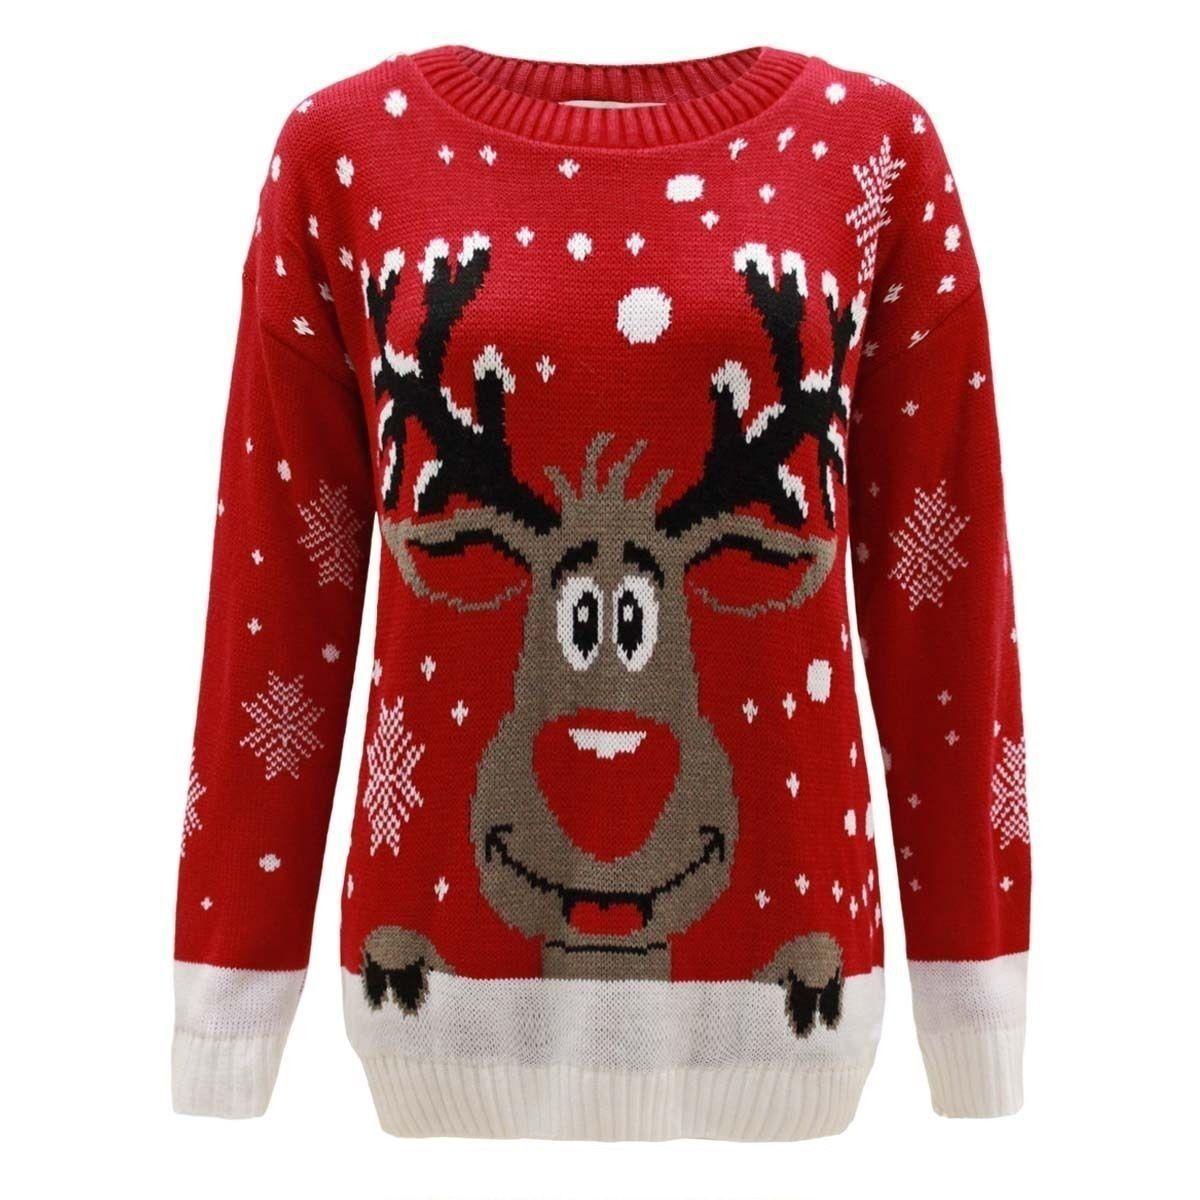 Kersttrui Olaf.Ladies Womens Mens Unisex Olaf Xmas Christmas Novelty Knitted Jumper